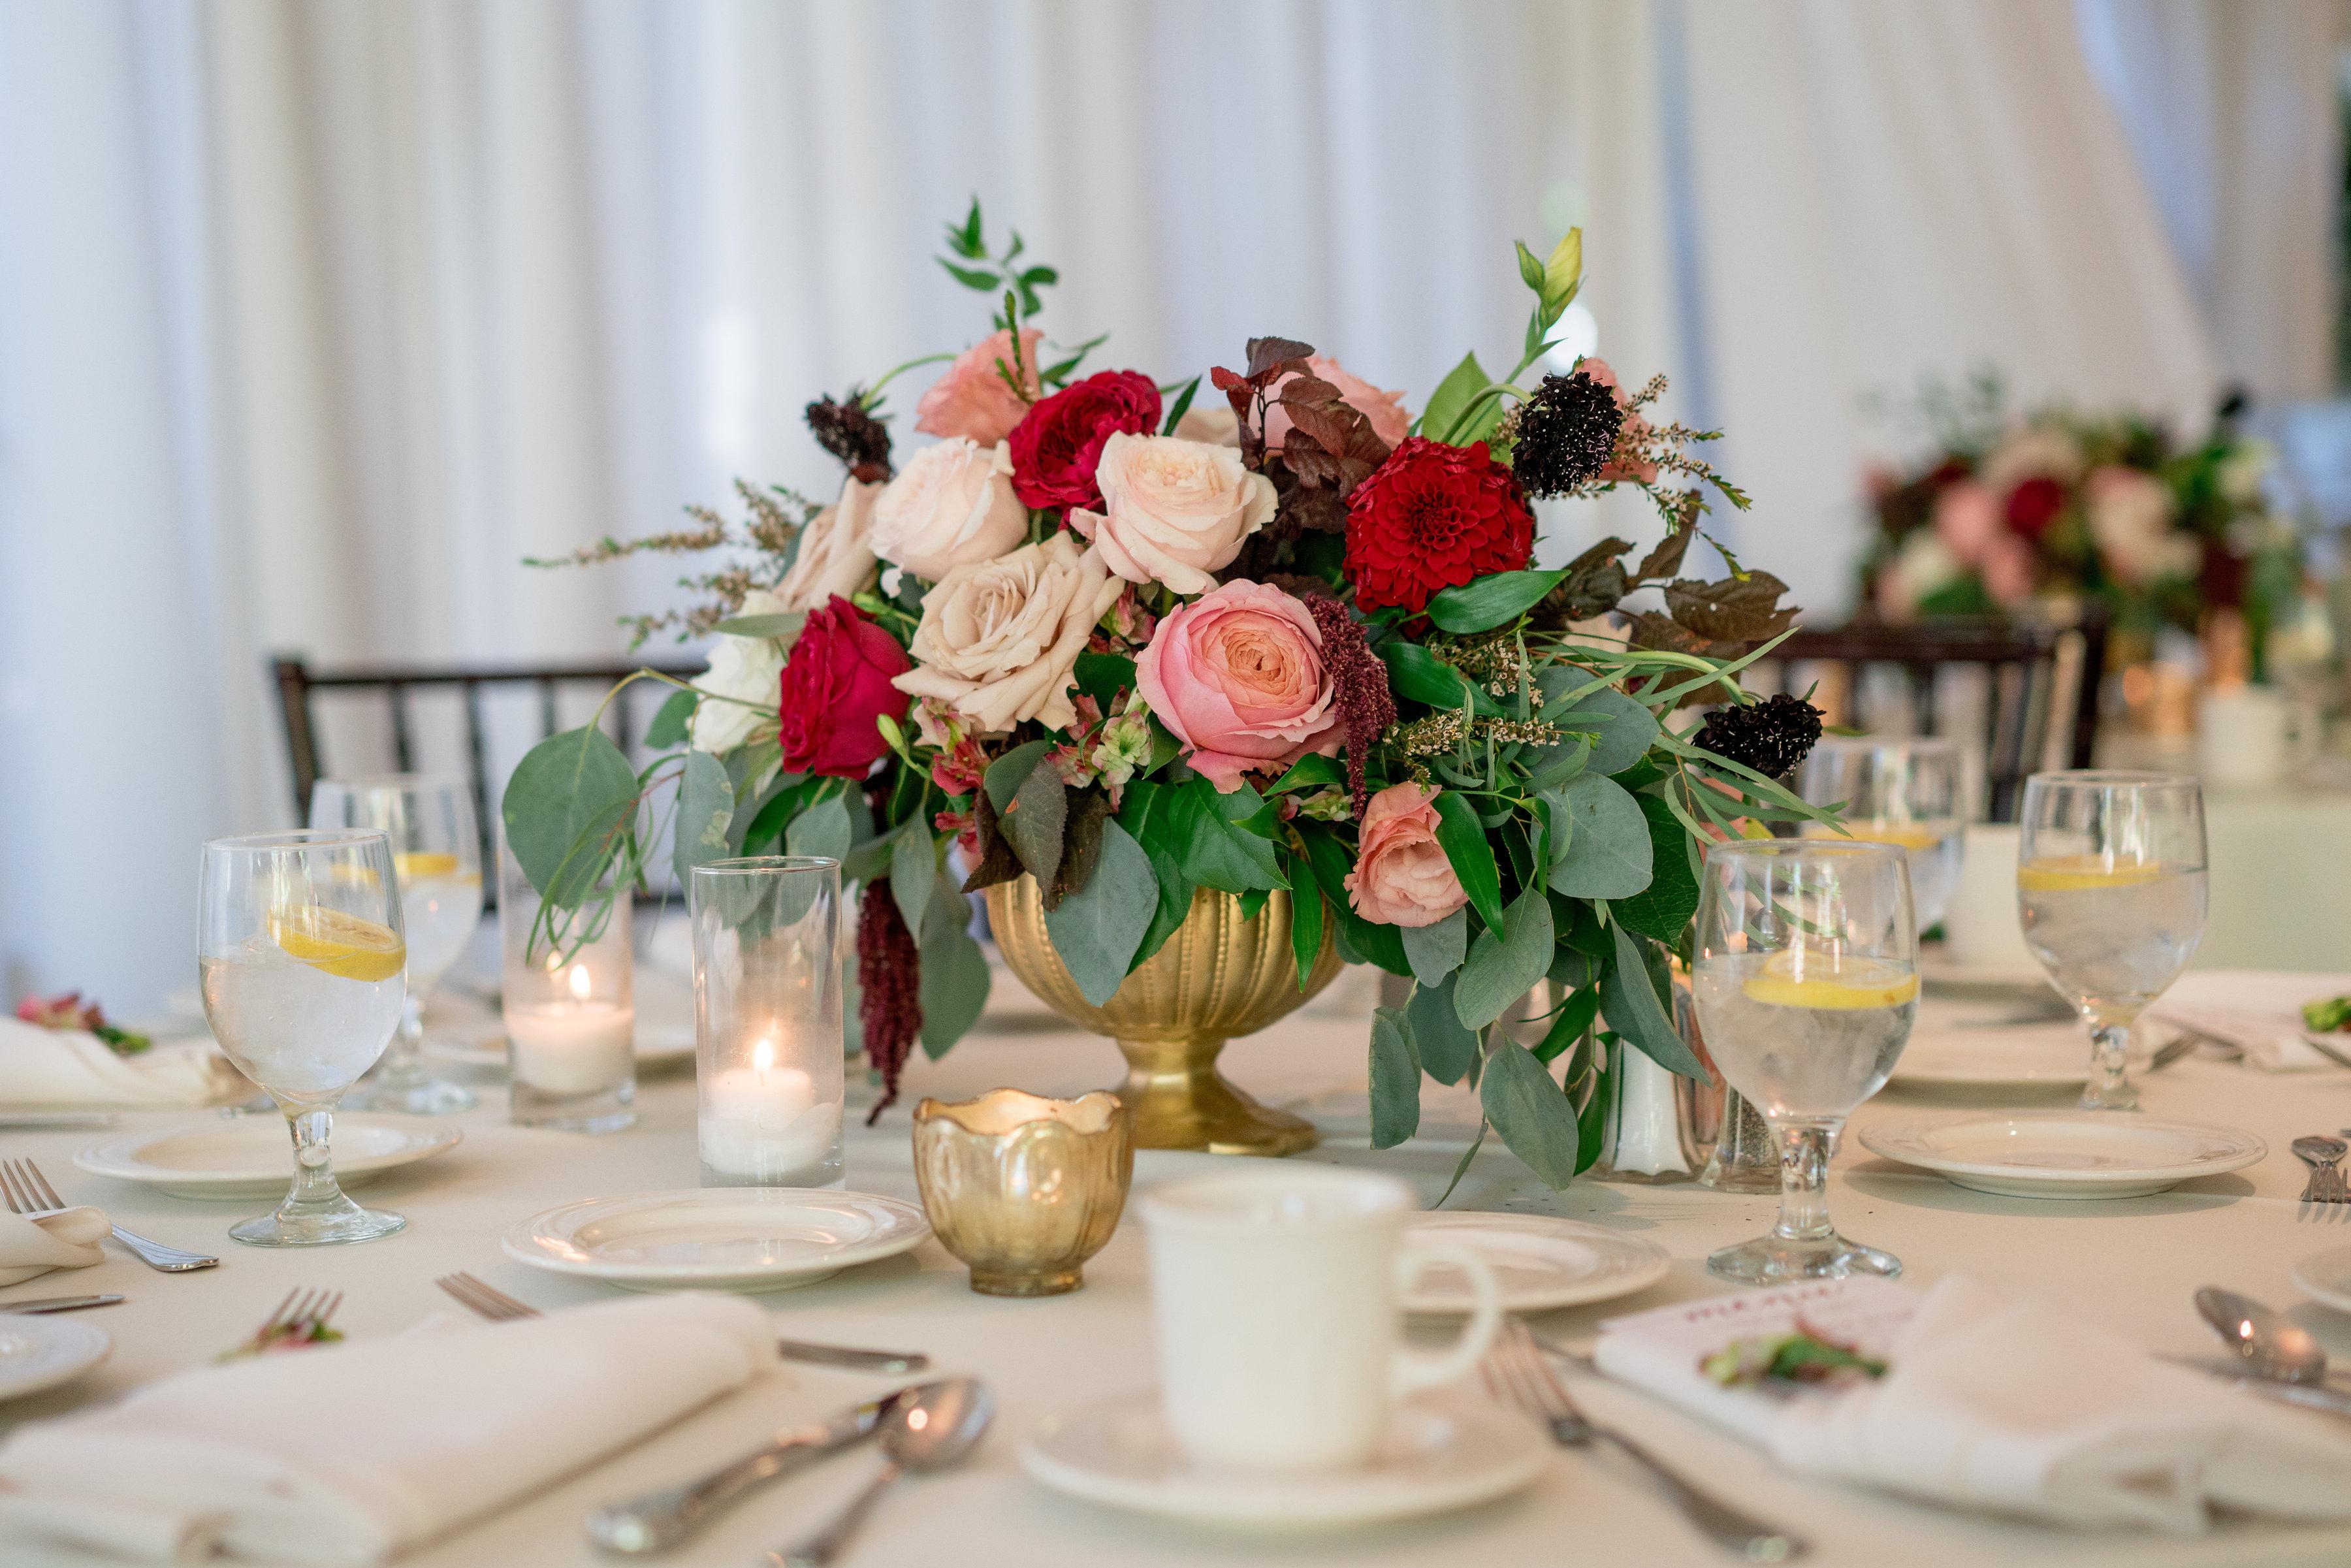 Wedding Reception Ideas Choosing Tall Vs Short Centerpiece Designs